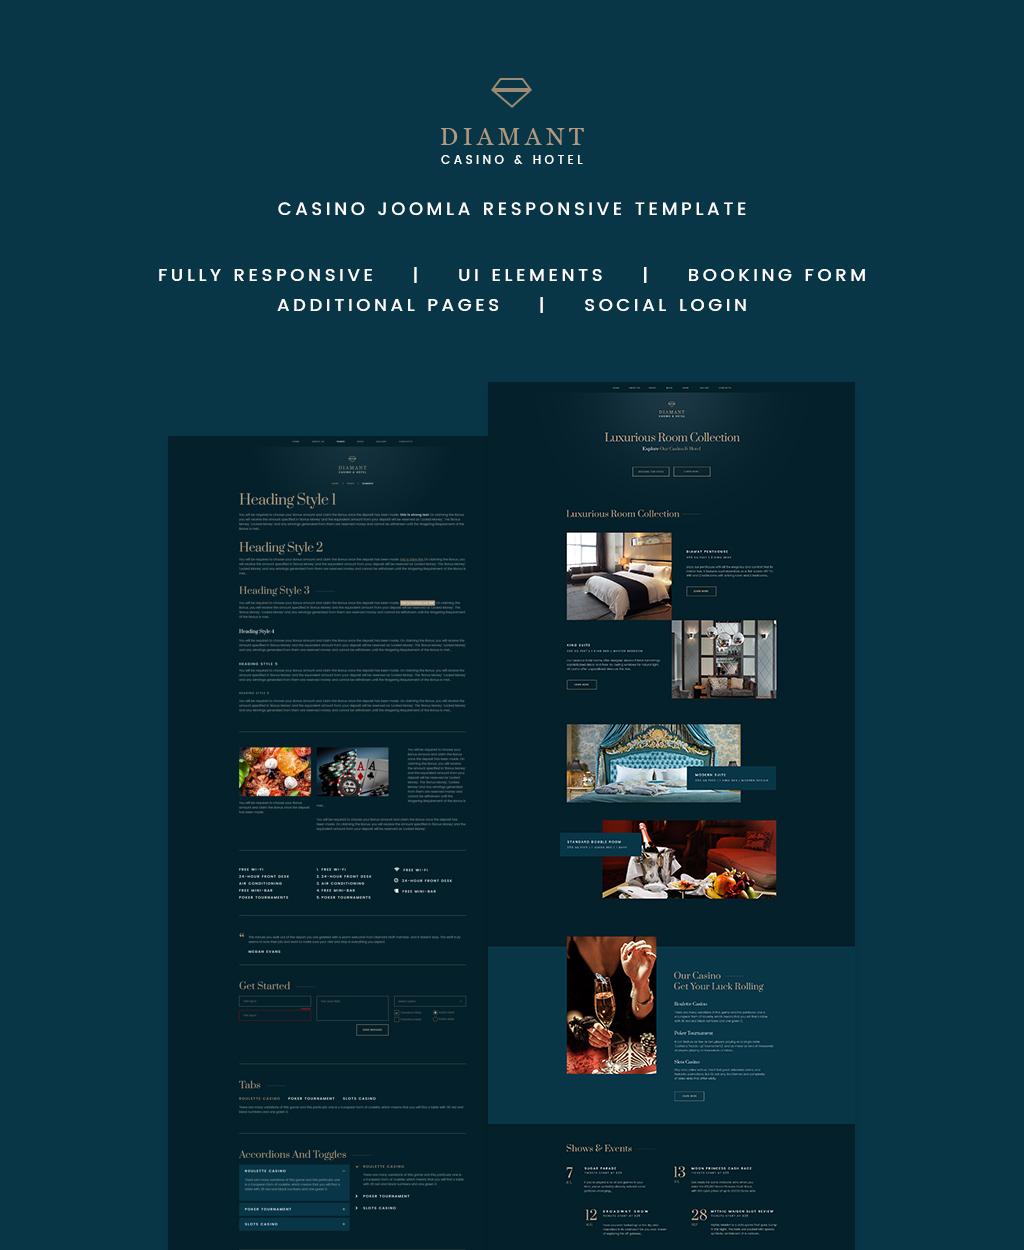 """Diamant - Casino & Hotel"" thème Joomla adaptatif #64731 - screenshot"